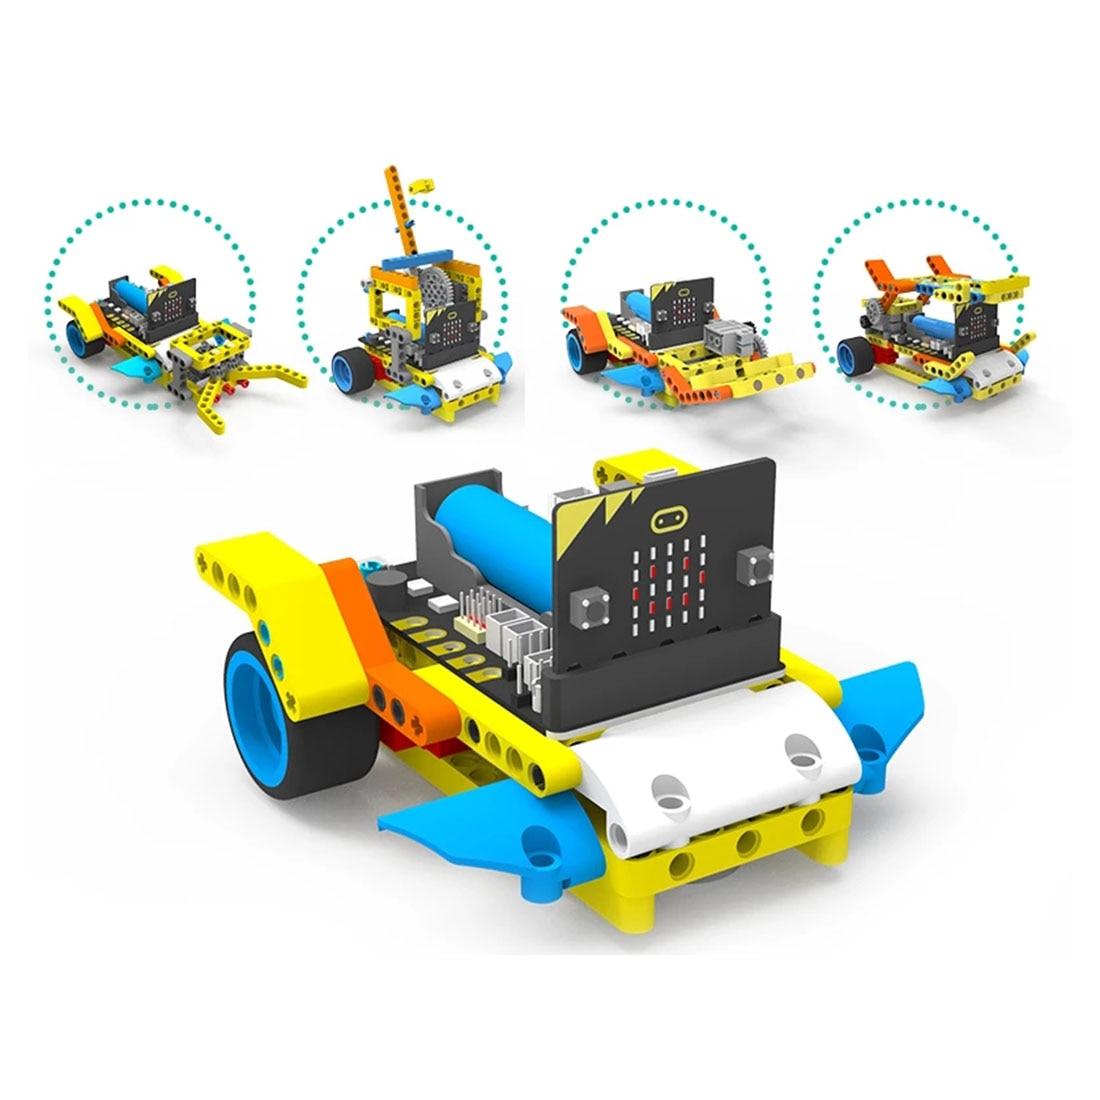 Program Intelligent Robot Building Block Car Kit Various Shape Steam Programming Education Car For Micro:bit(Not Micro:bit Board